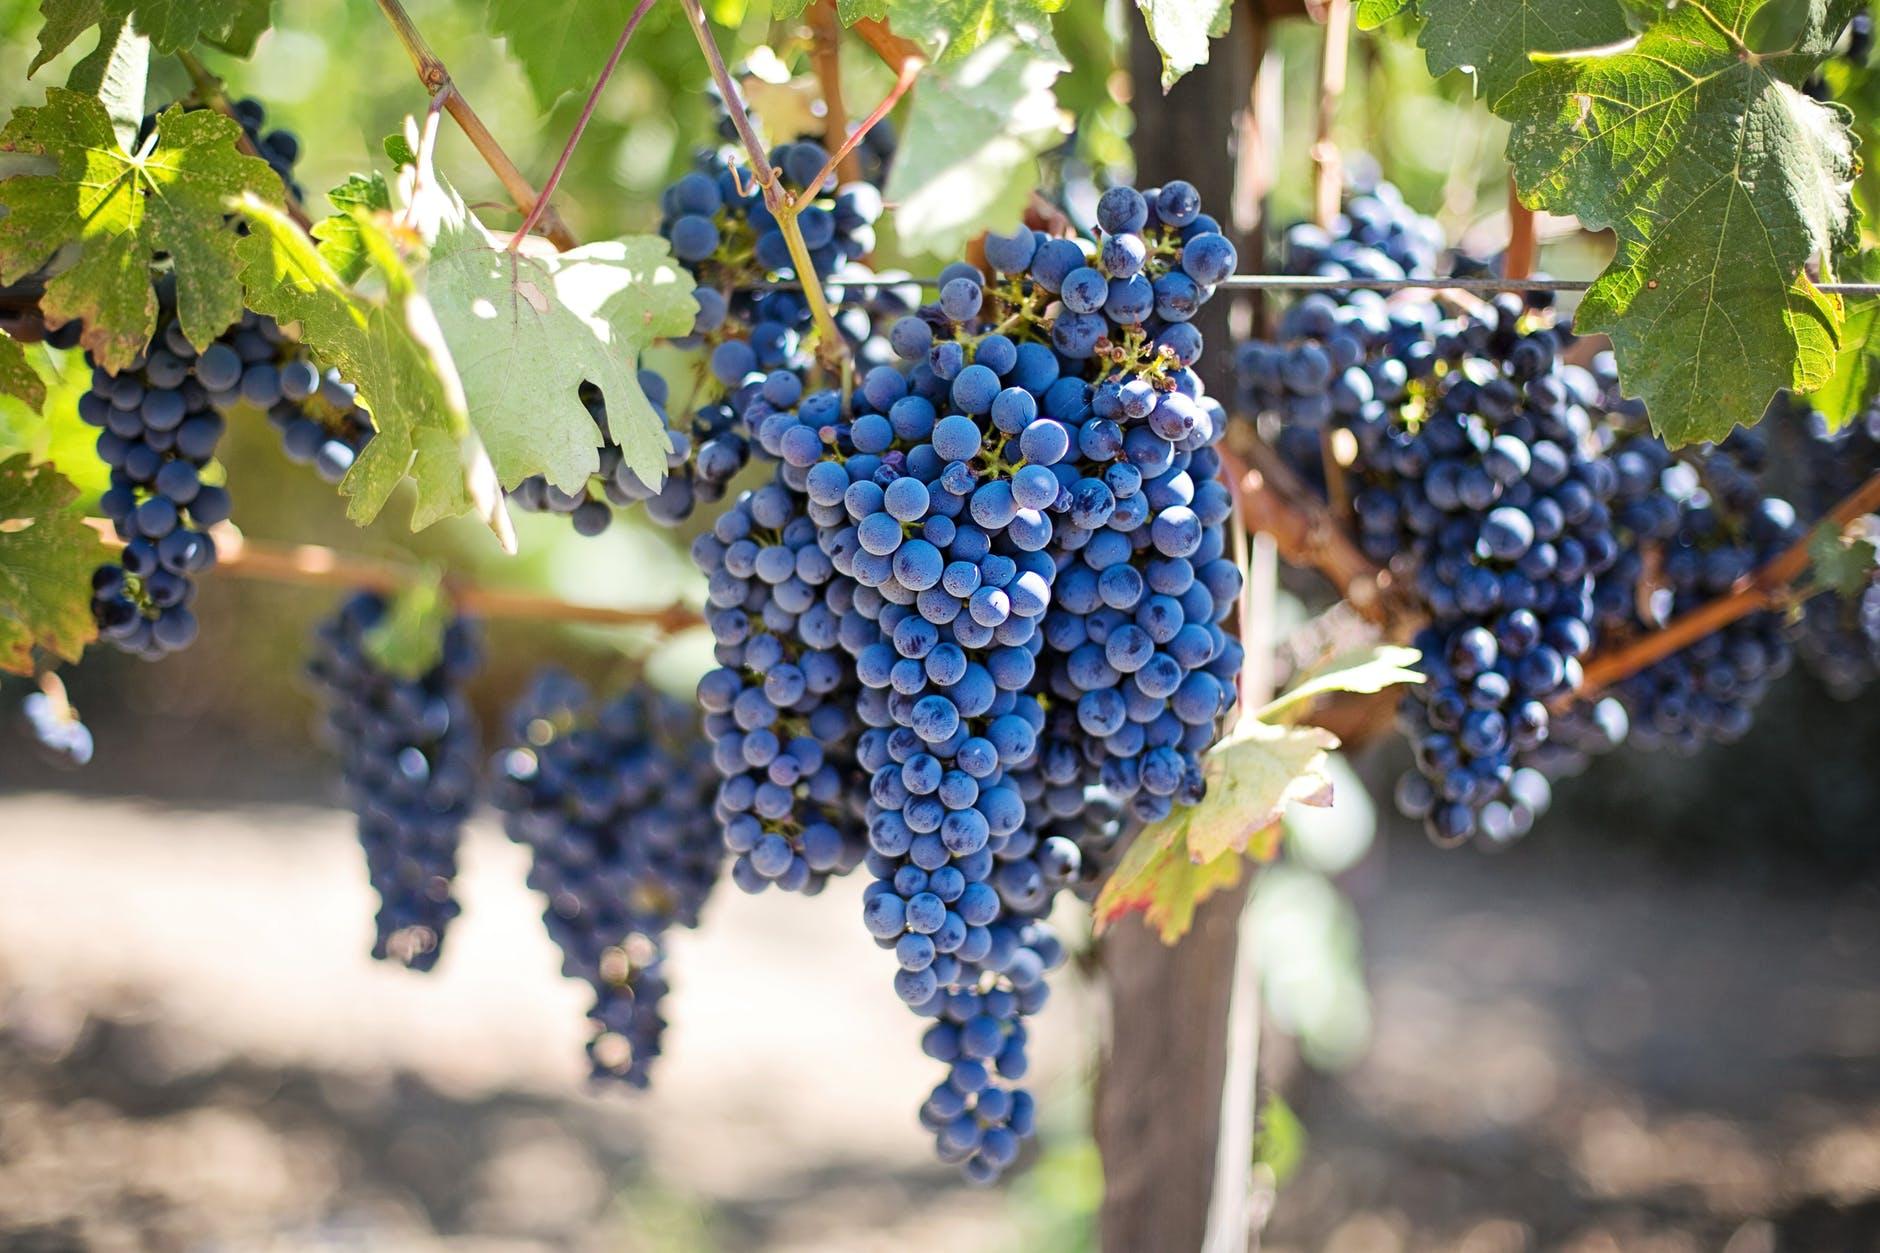 grapes vineyard vine purple grapes